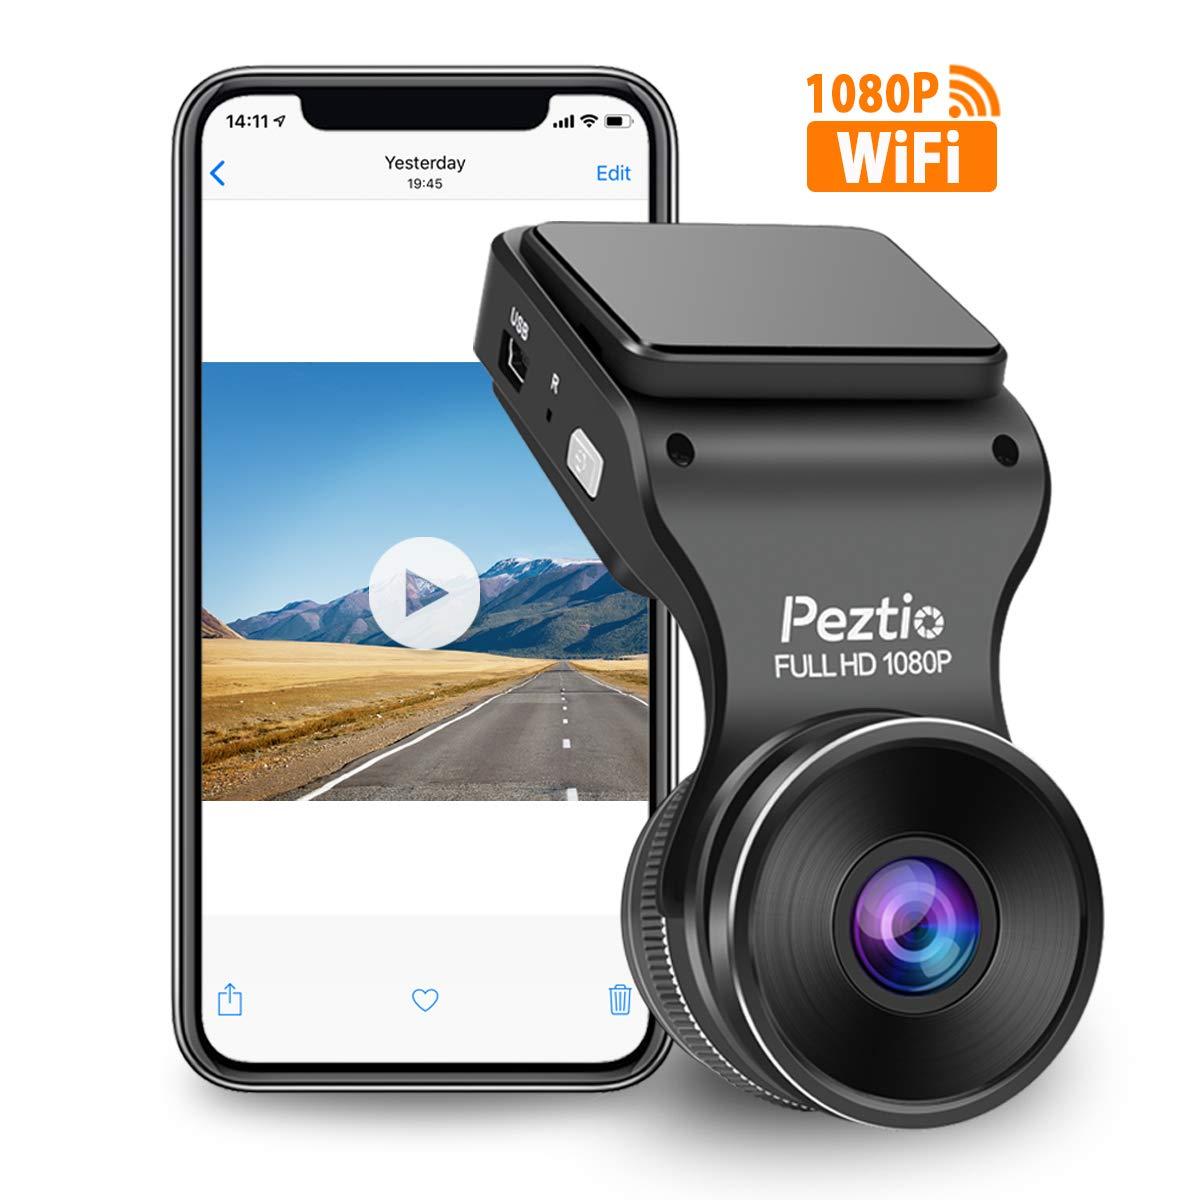 Peztio Dash Cam WiFi, FHD 1080P Dash Camera for Cars, Car Dash Camera Recorder, G-Sensor, 170 Wide Angle, Loop Recording, Parking Monitor, WDR, Night Vision, Motion Detection